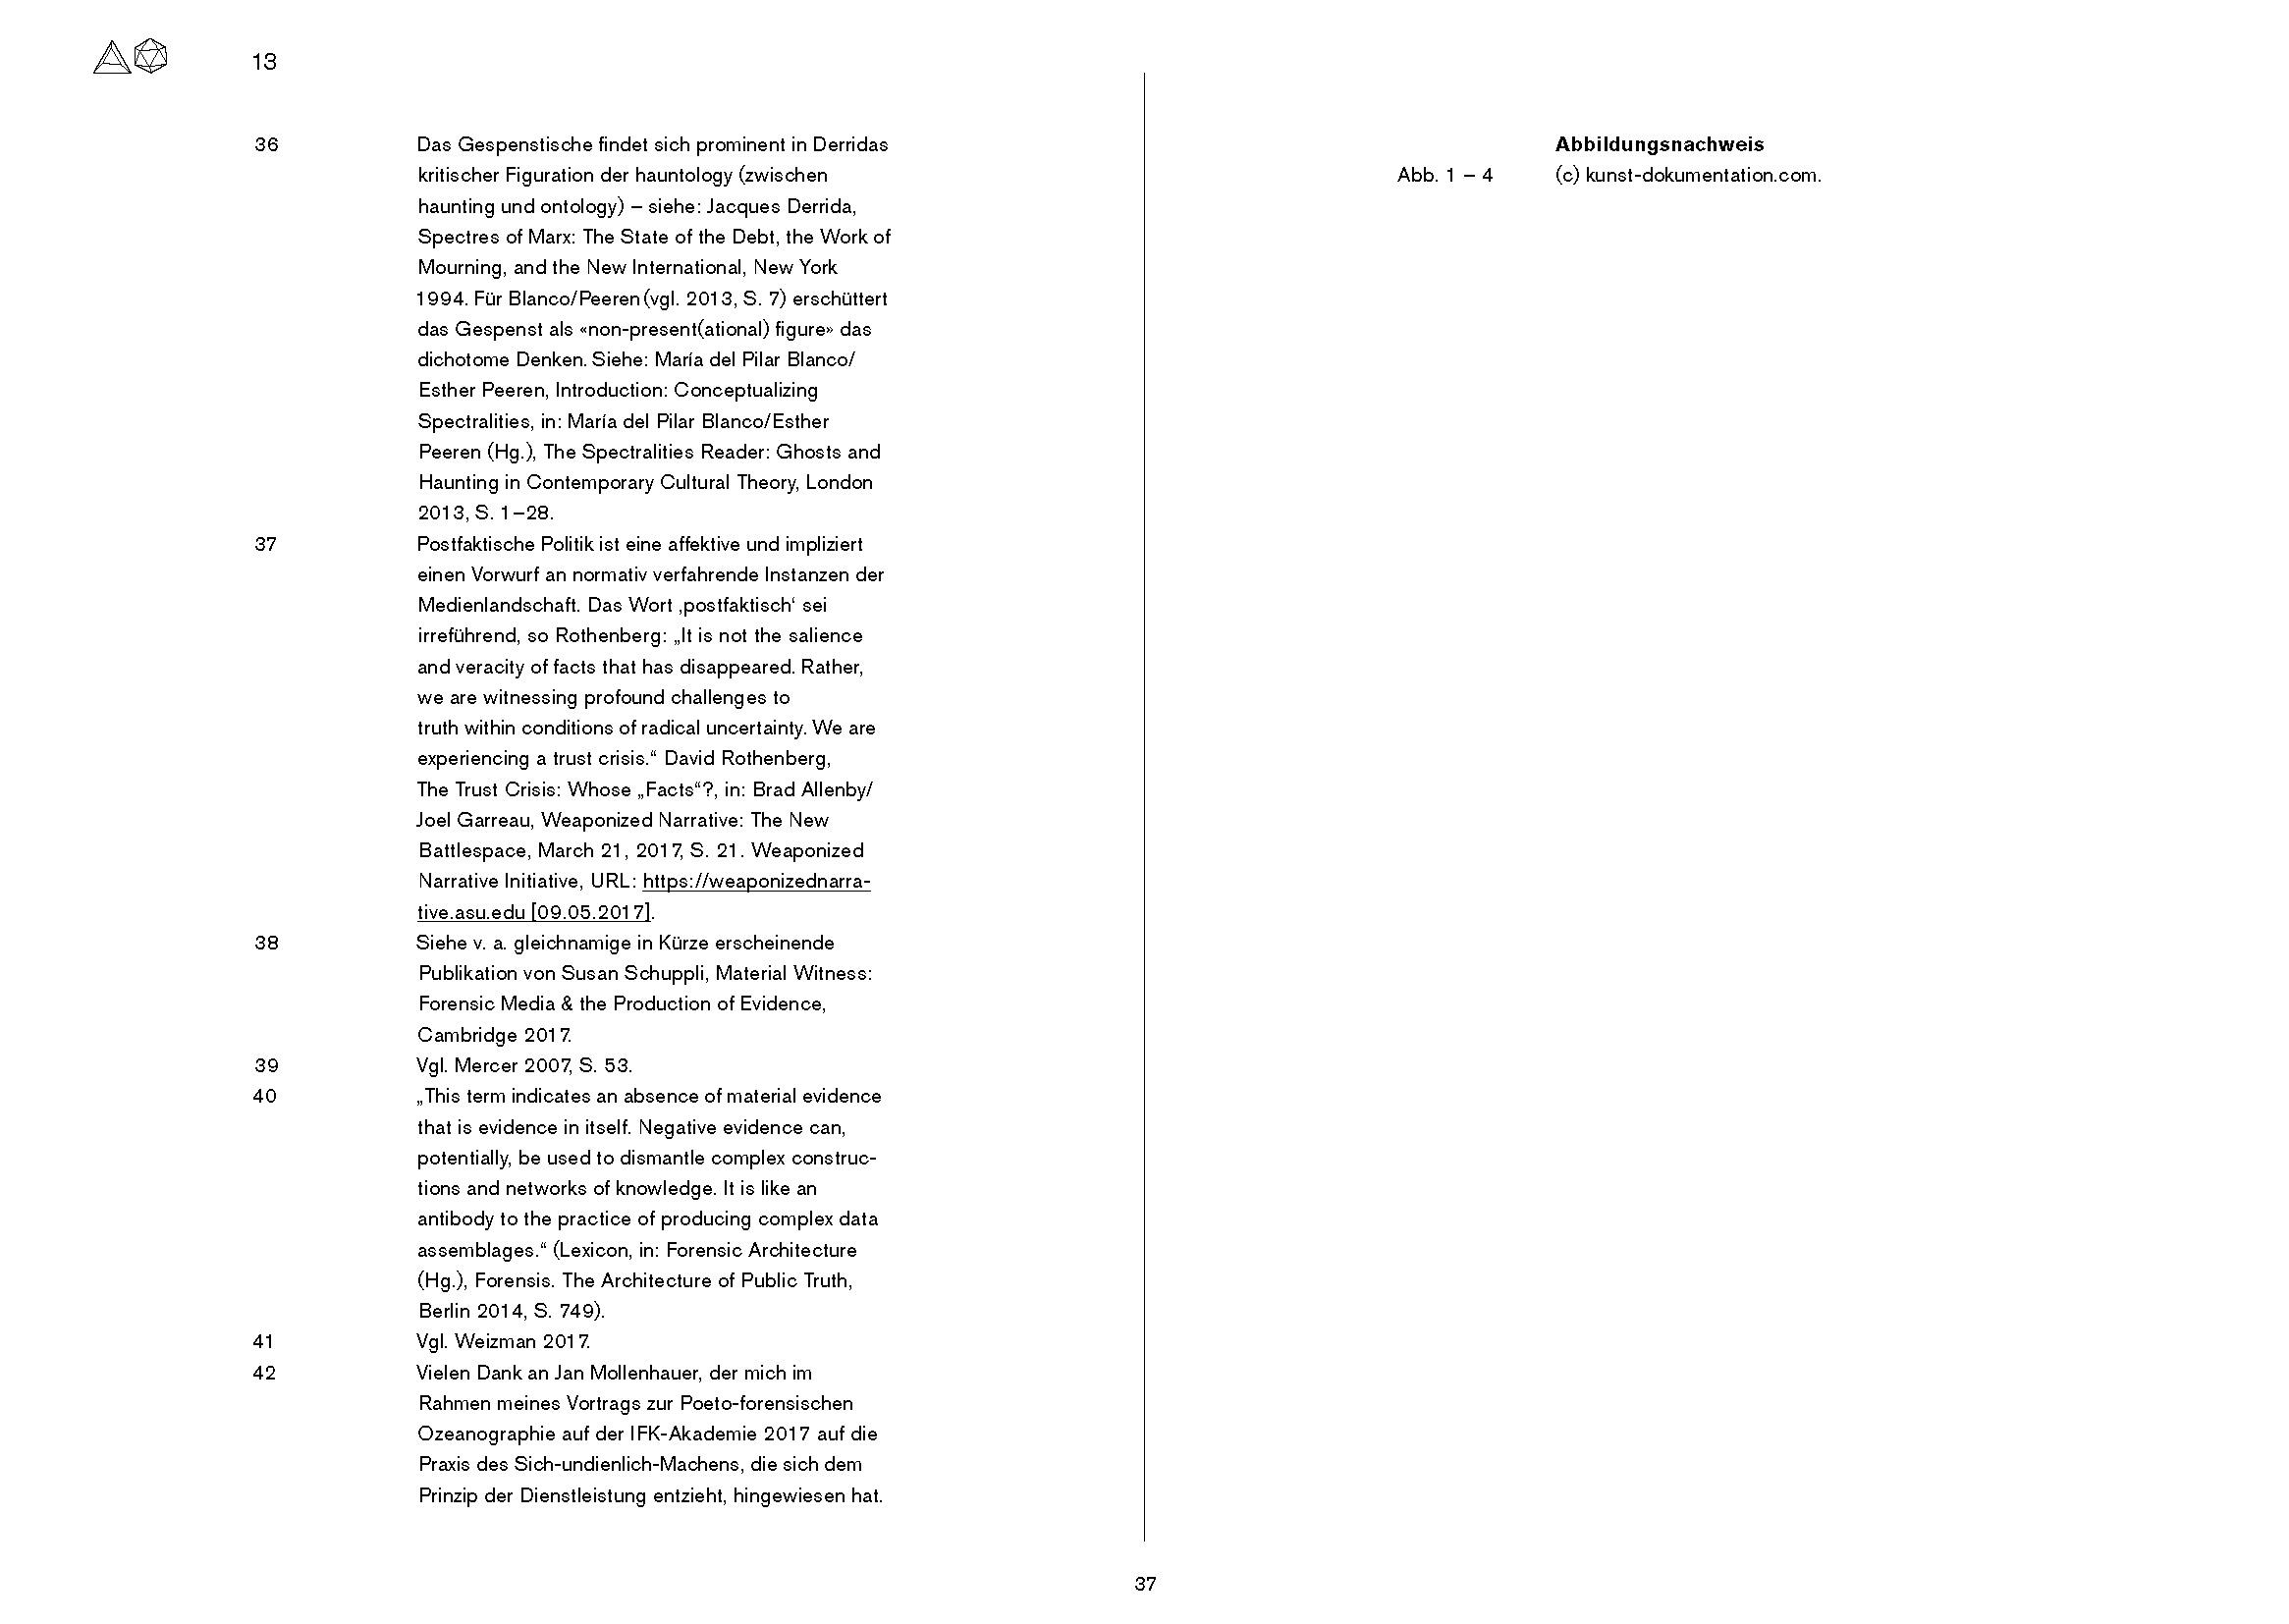 NEU_AO_13_4_Stuckey_Seite_11.jpg